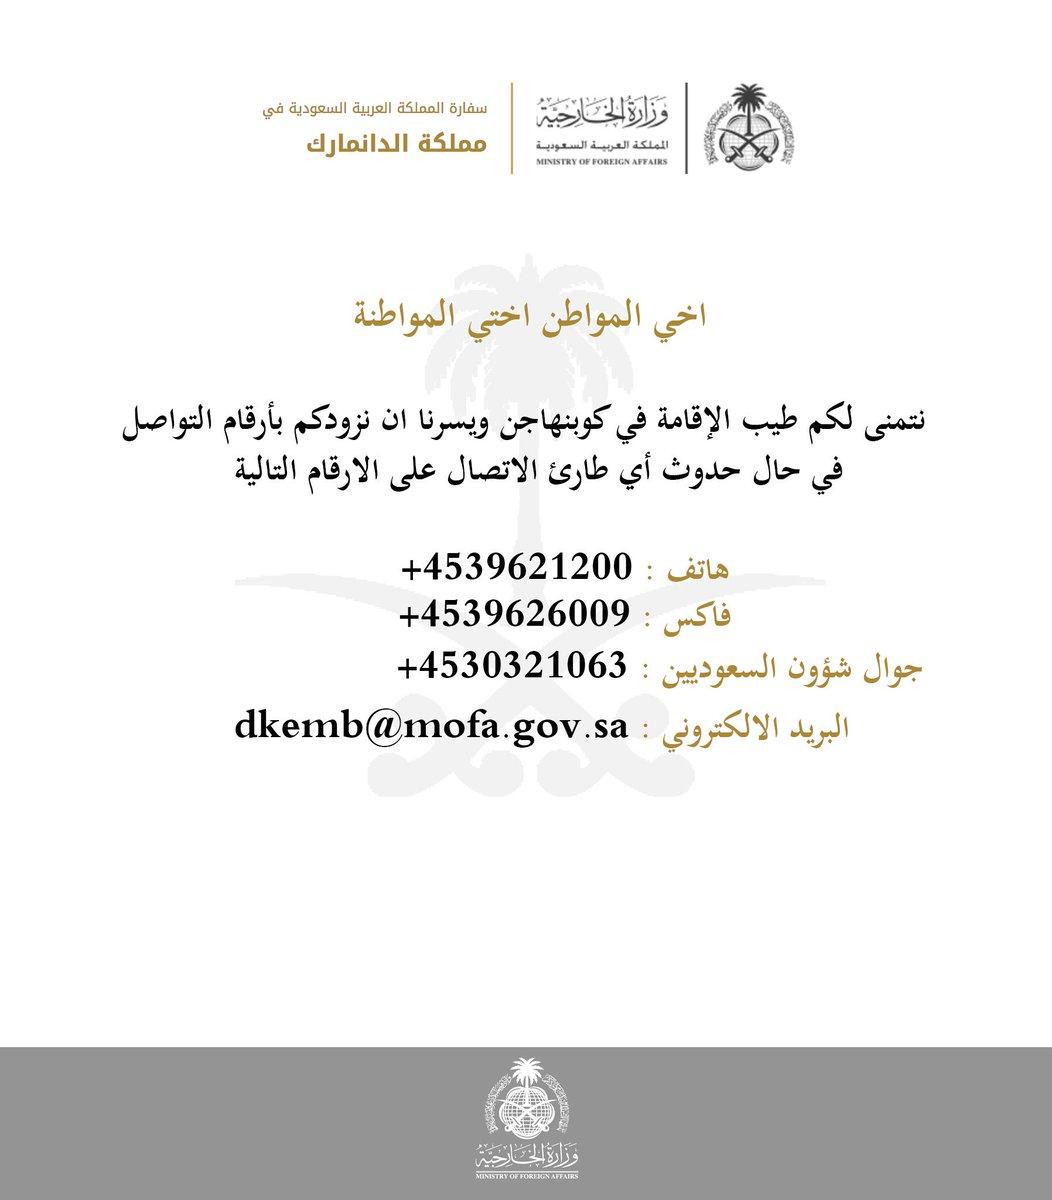 saudi arabiske ambassade i danmark